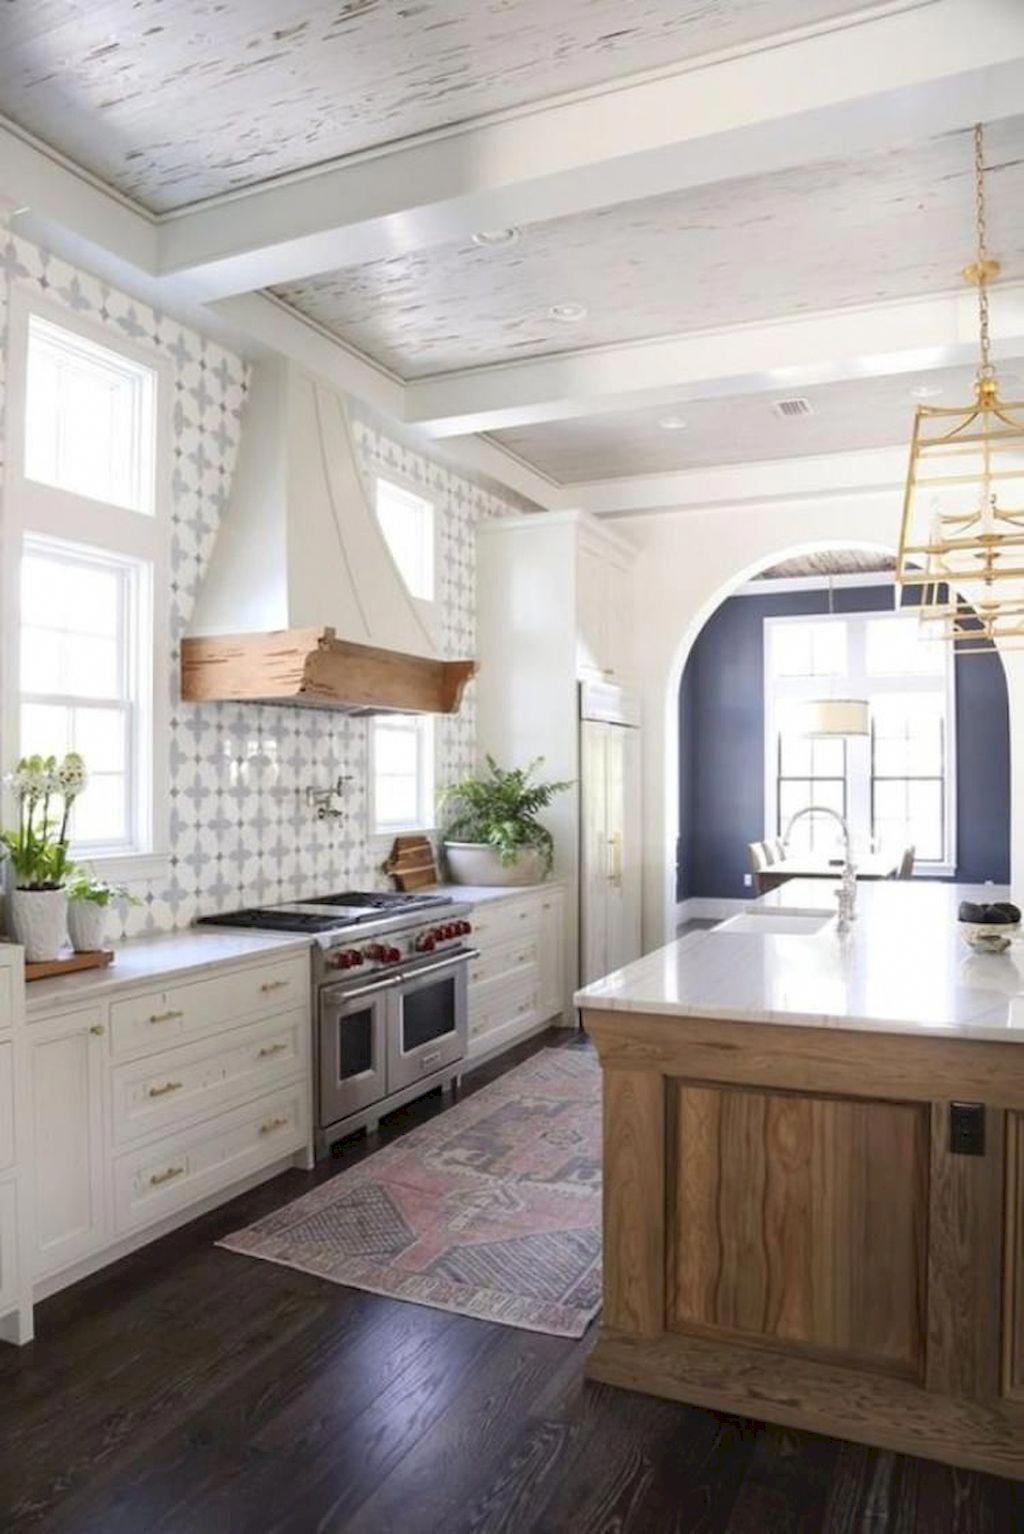 Kitchen Wall Decor Ideas Turquoise And Brown Kitchen Decor